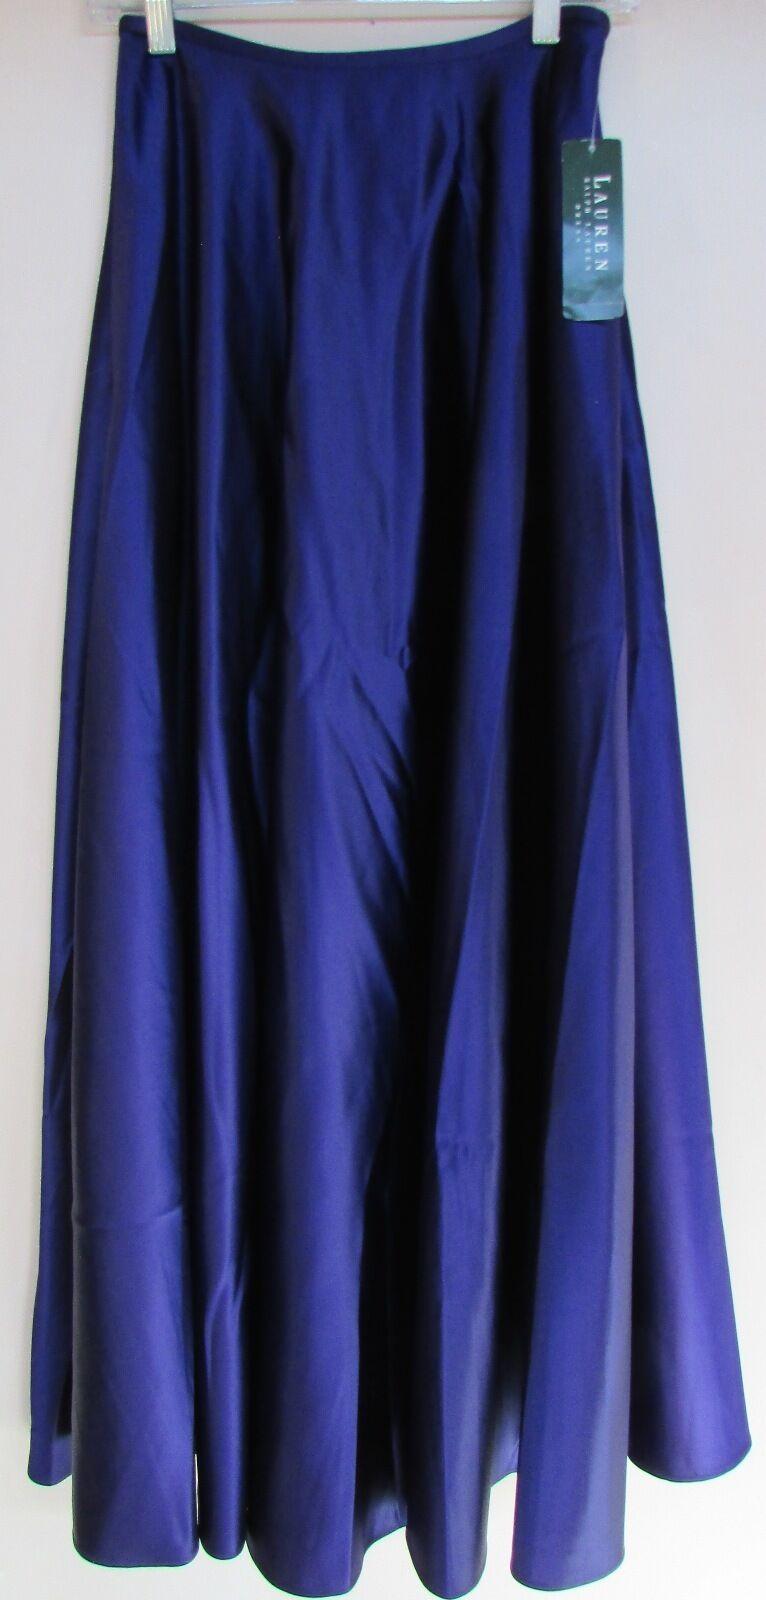 169.00 NWT Ralph Lauren Long Full Formal Skirt  Royal Purple  Chamonix  Sz 4